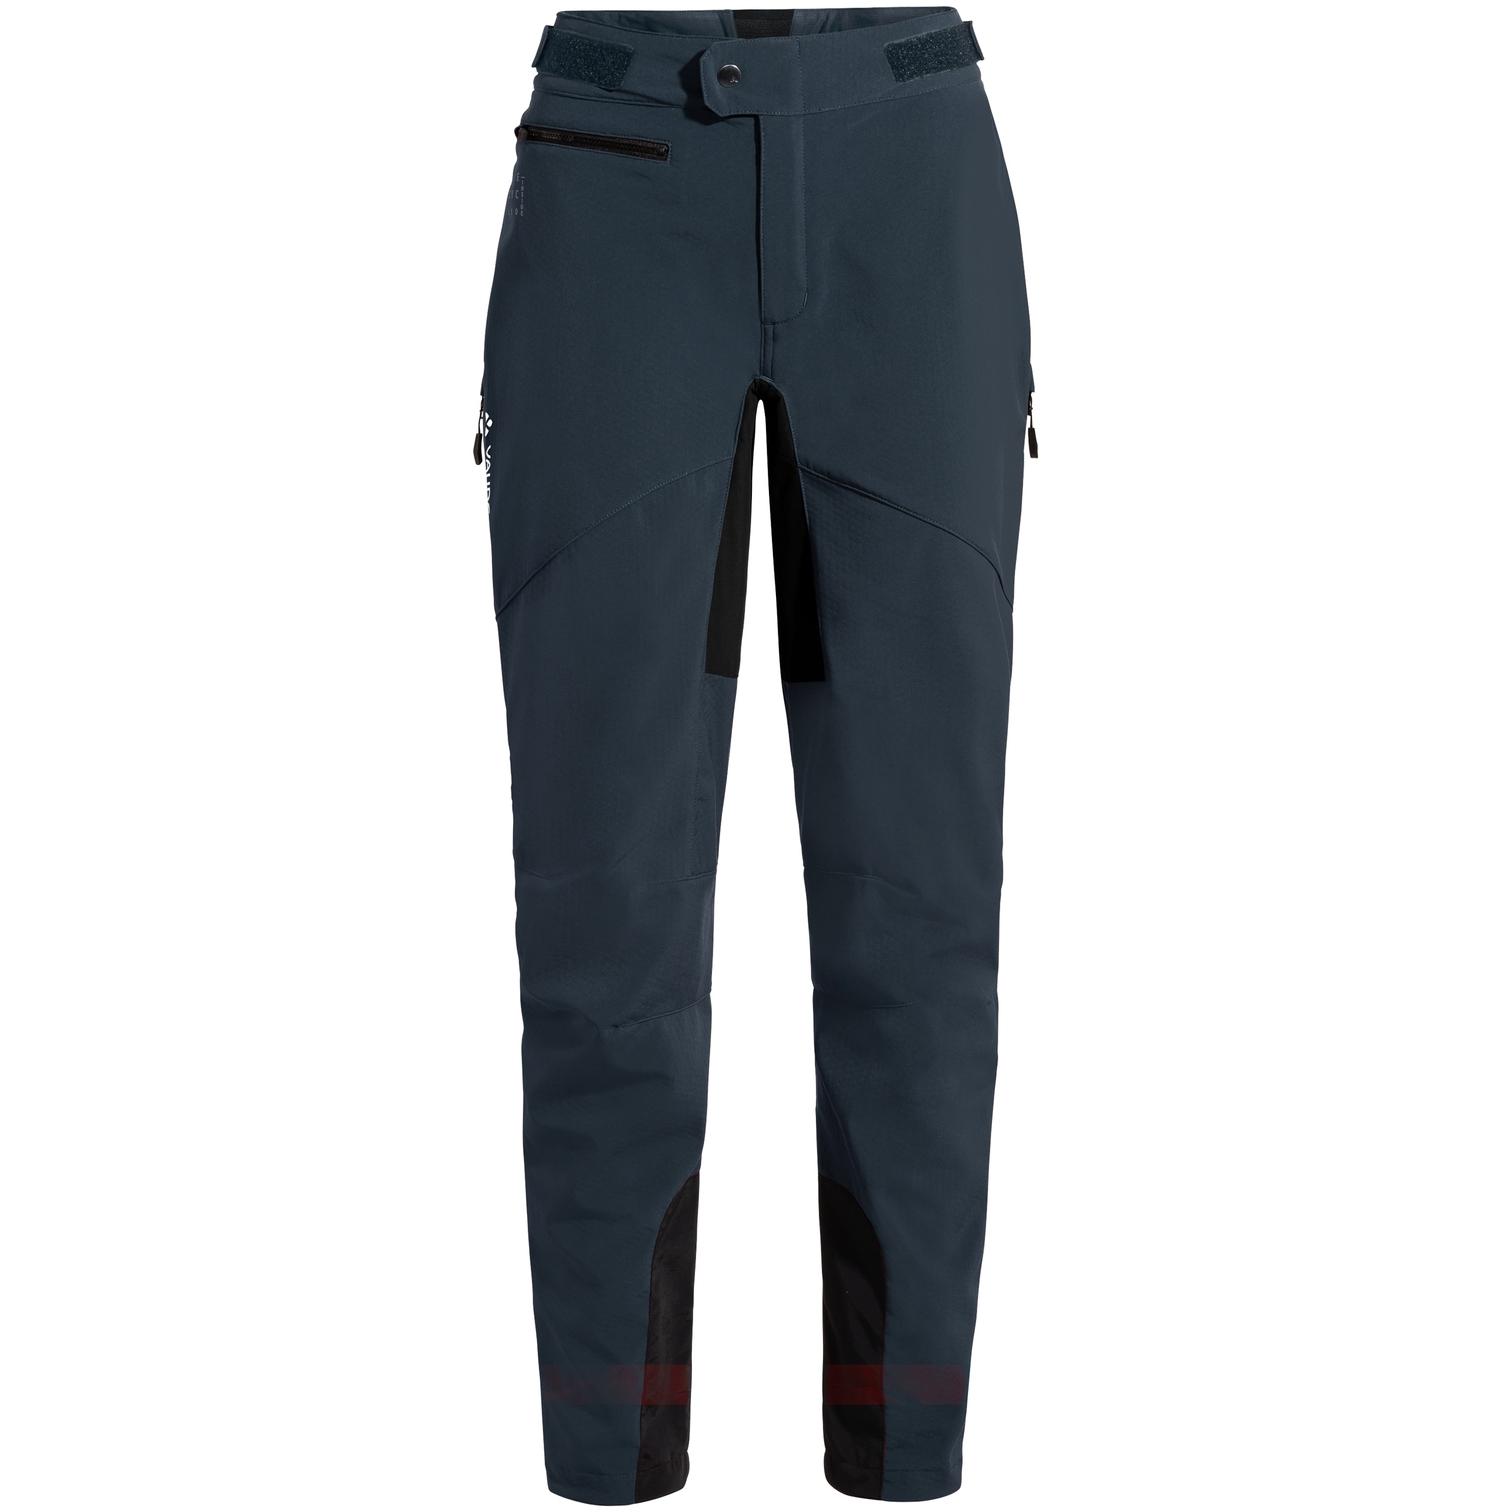 Vaude Women's Qimsa Softshell Pants II - dark sea